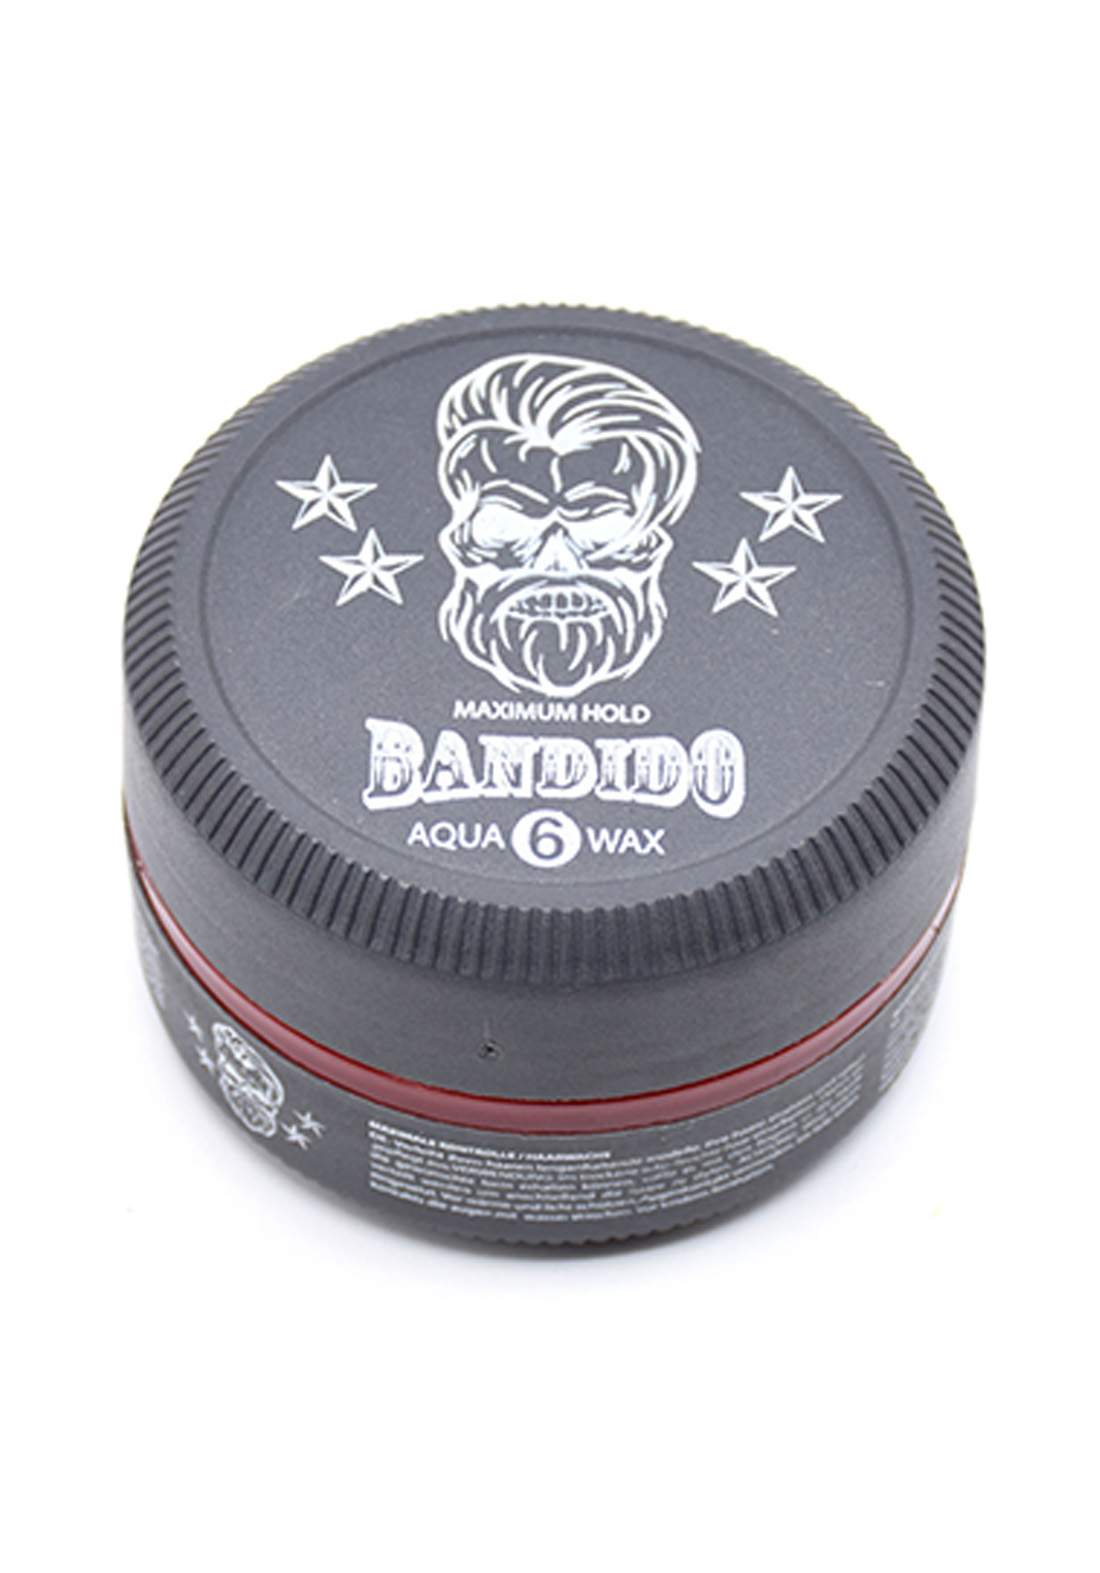 Bandido Aqua 6 Wax  Maximum Hold-150ml جل تصفيف الشعر